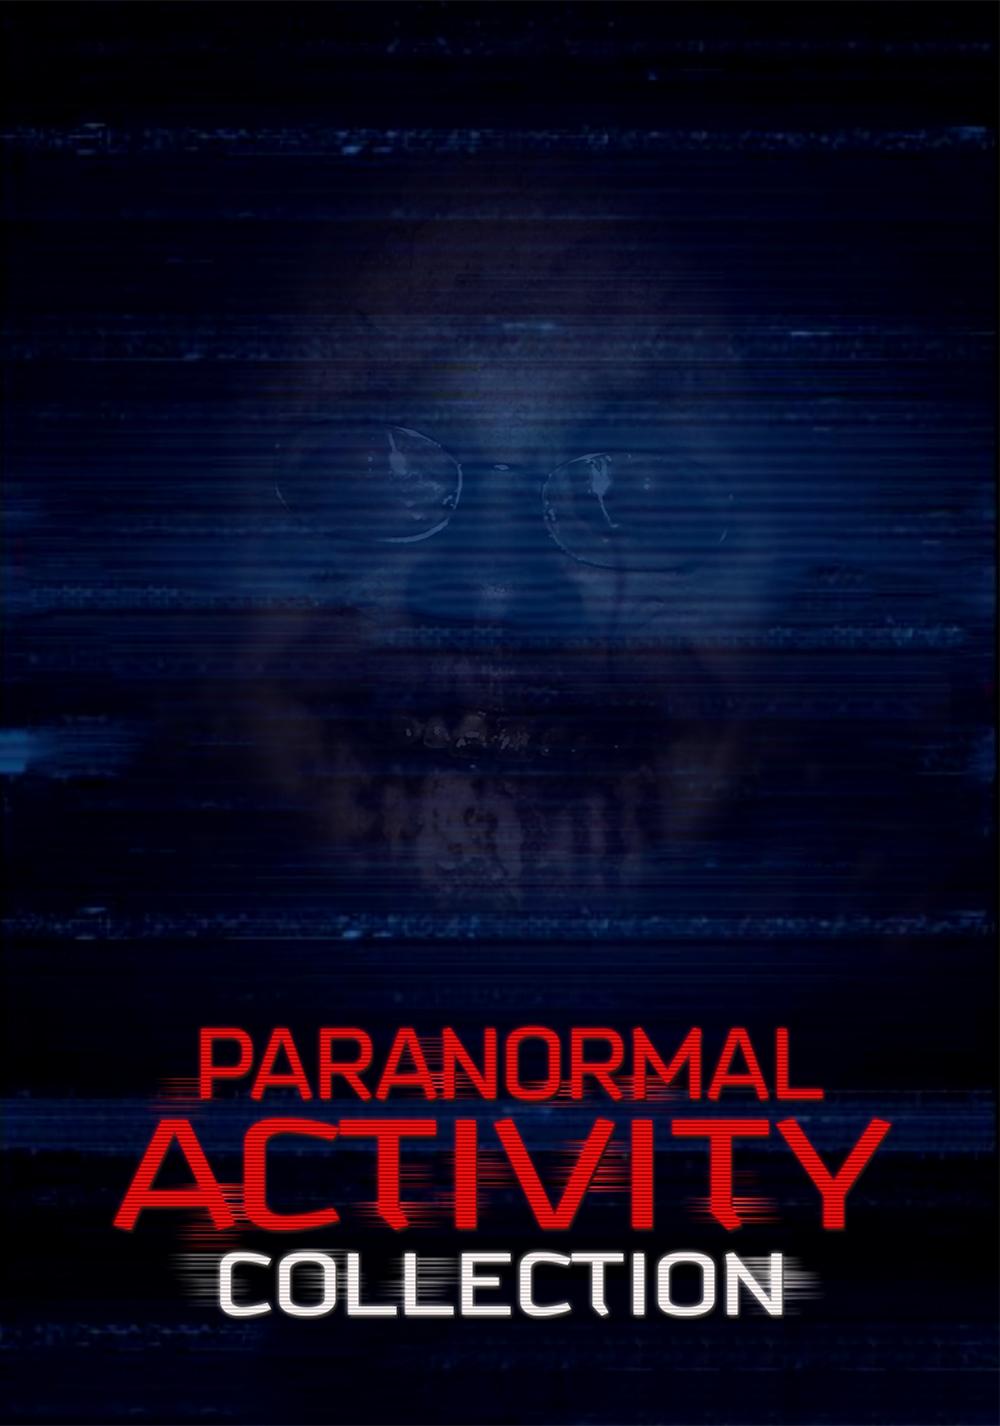 paranormal activity Buy paranormal activity: read 788 movies & tv reviews - amazoncom.